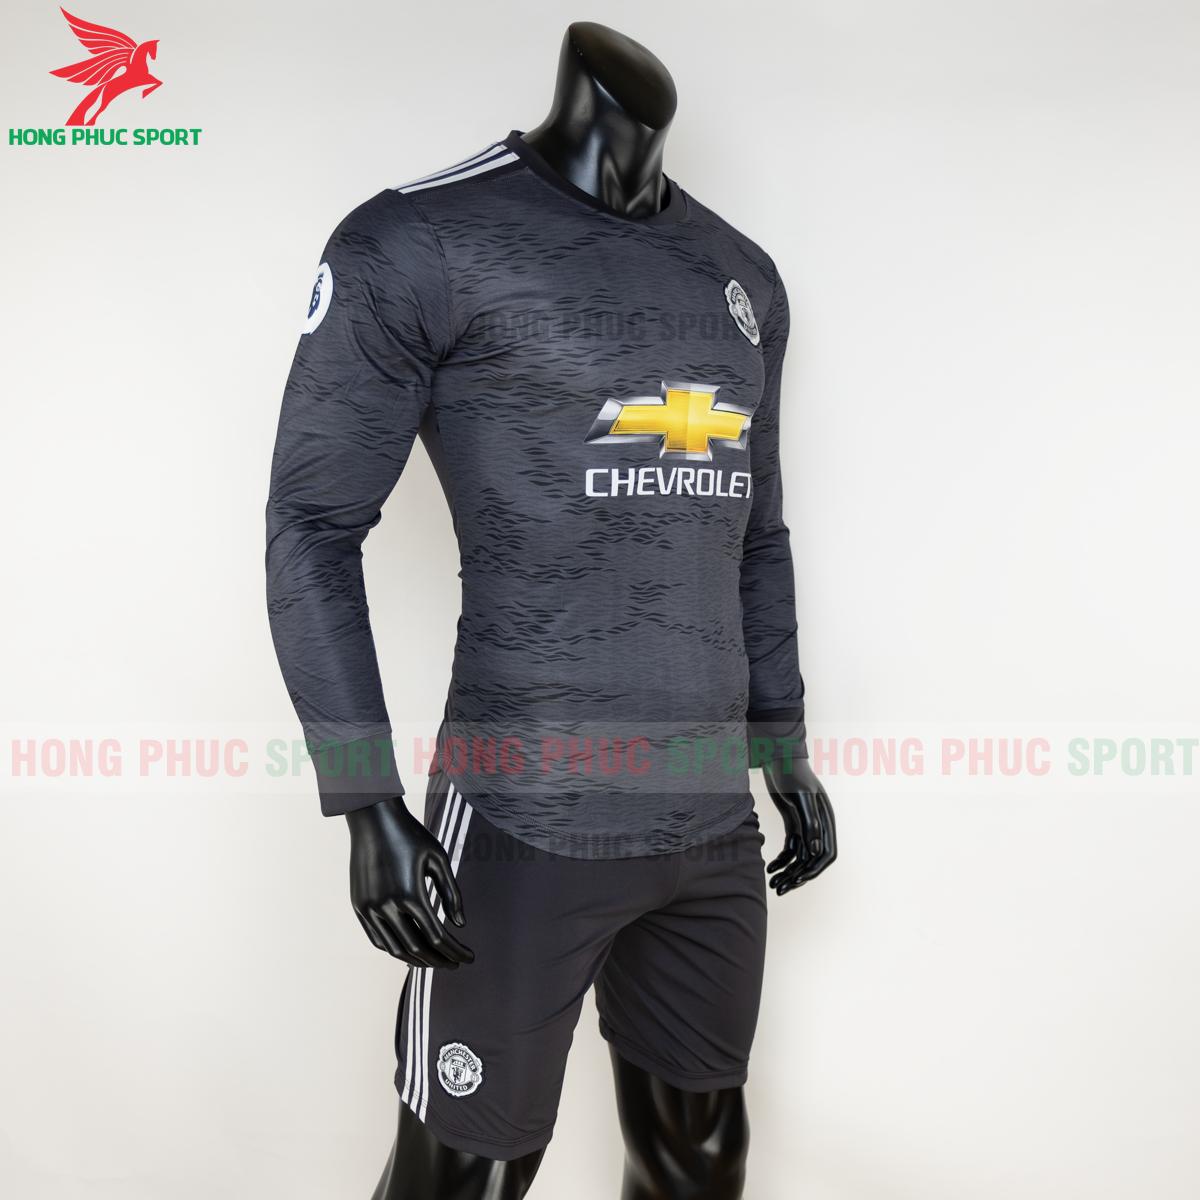 https://cdn.hongphucsport.com/unsafe/s4.shopbay.vn/files/285/ao-dai-tay-manchester-united-2020-san-khach-4-5f8fde1ff25fb.png